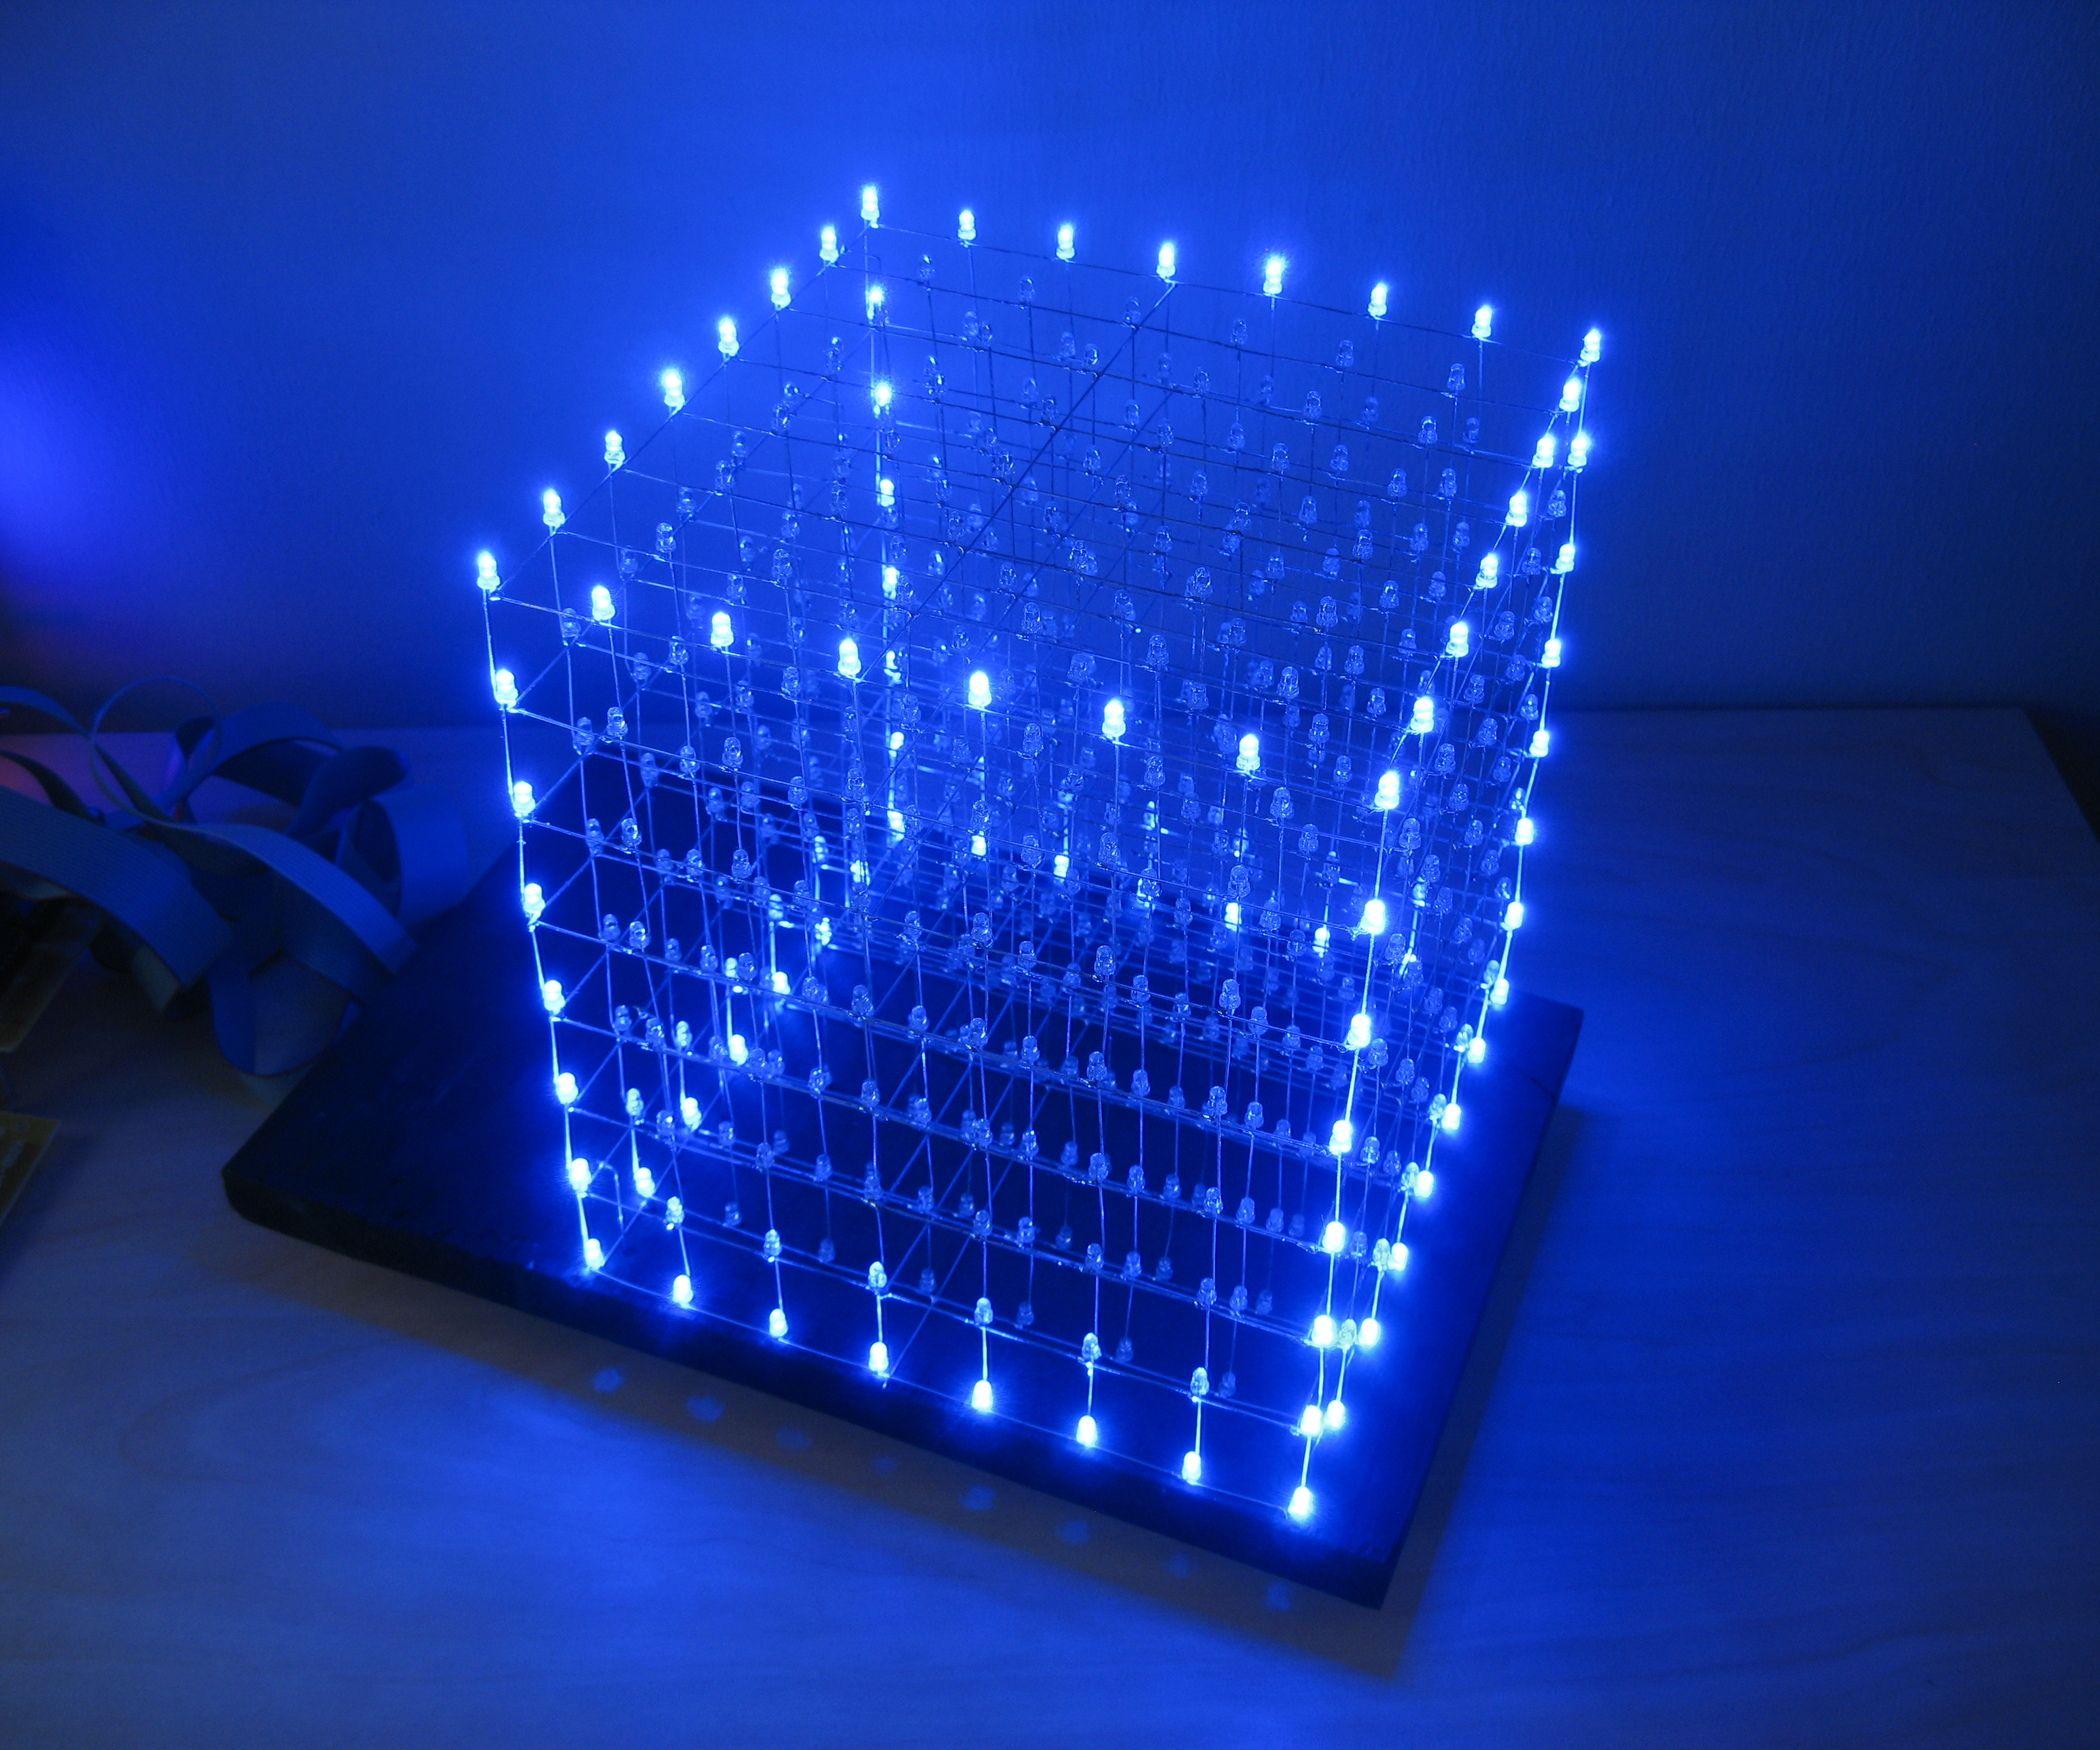 led cube 8x8x8 tutorials and tips arduino led cube arduino